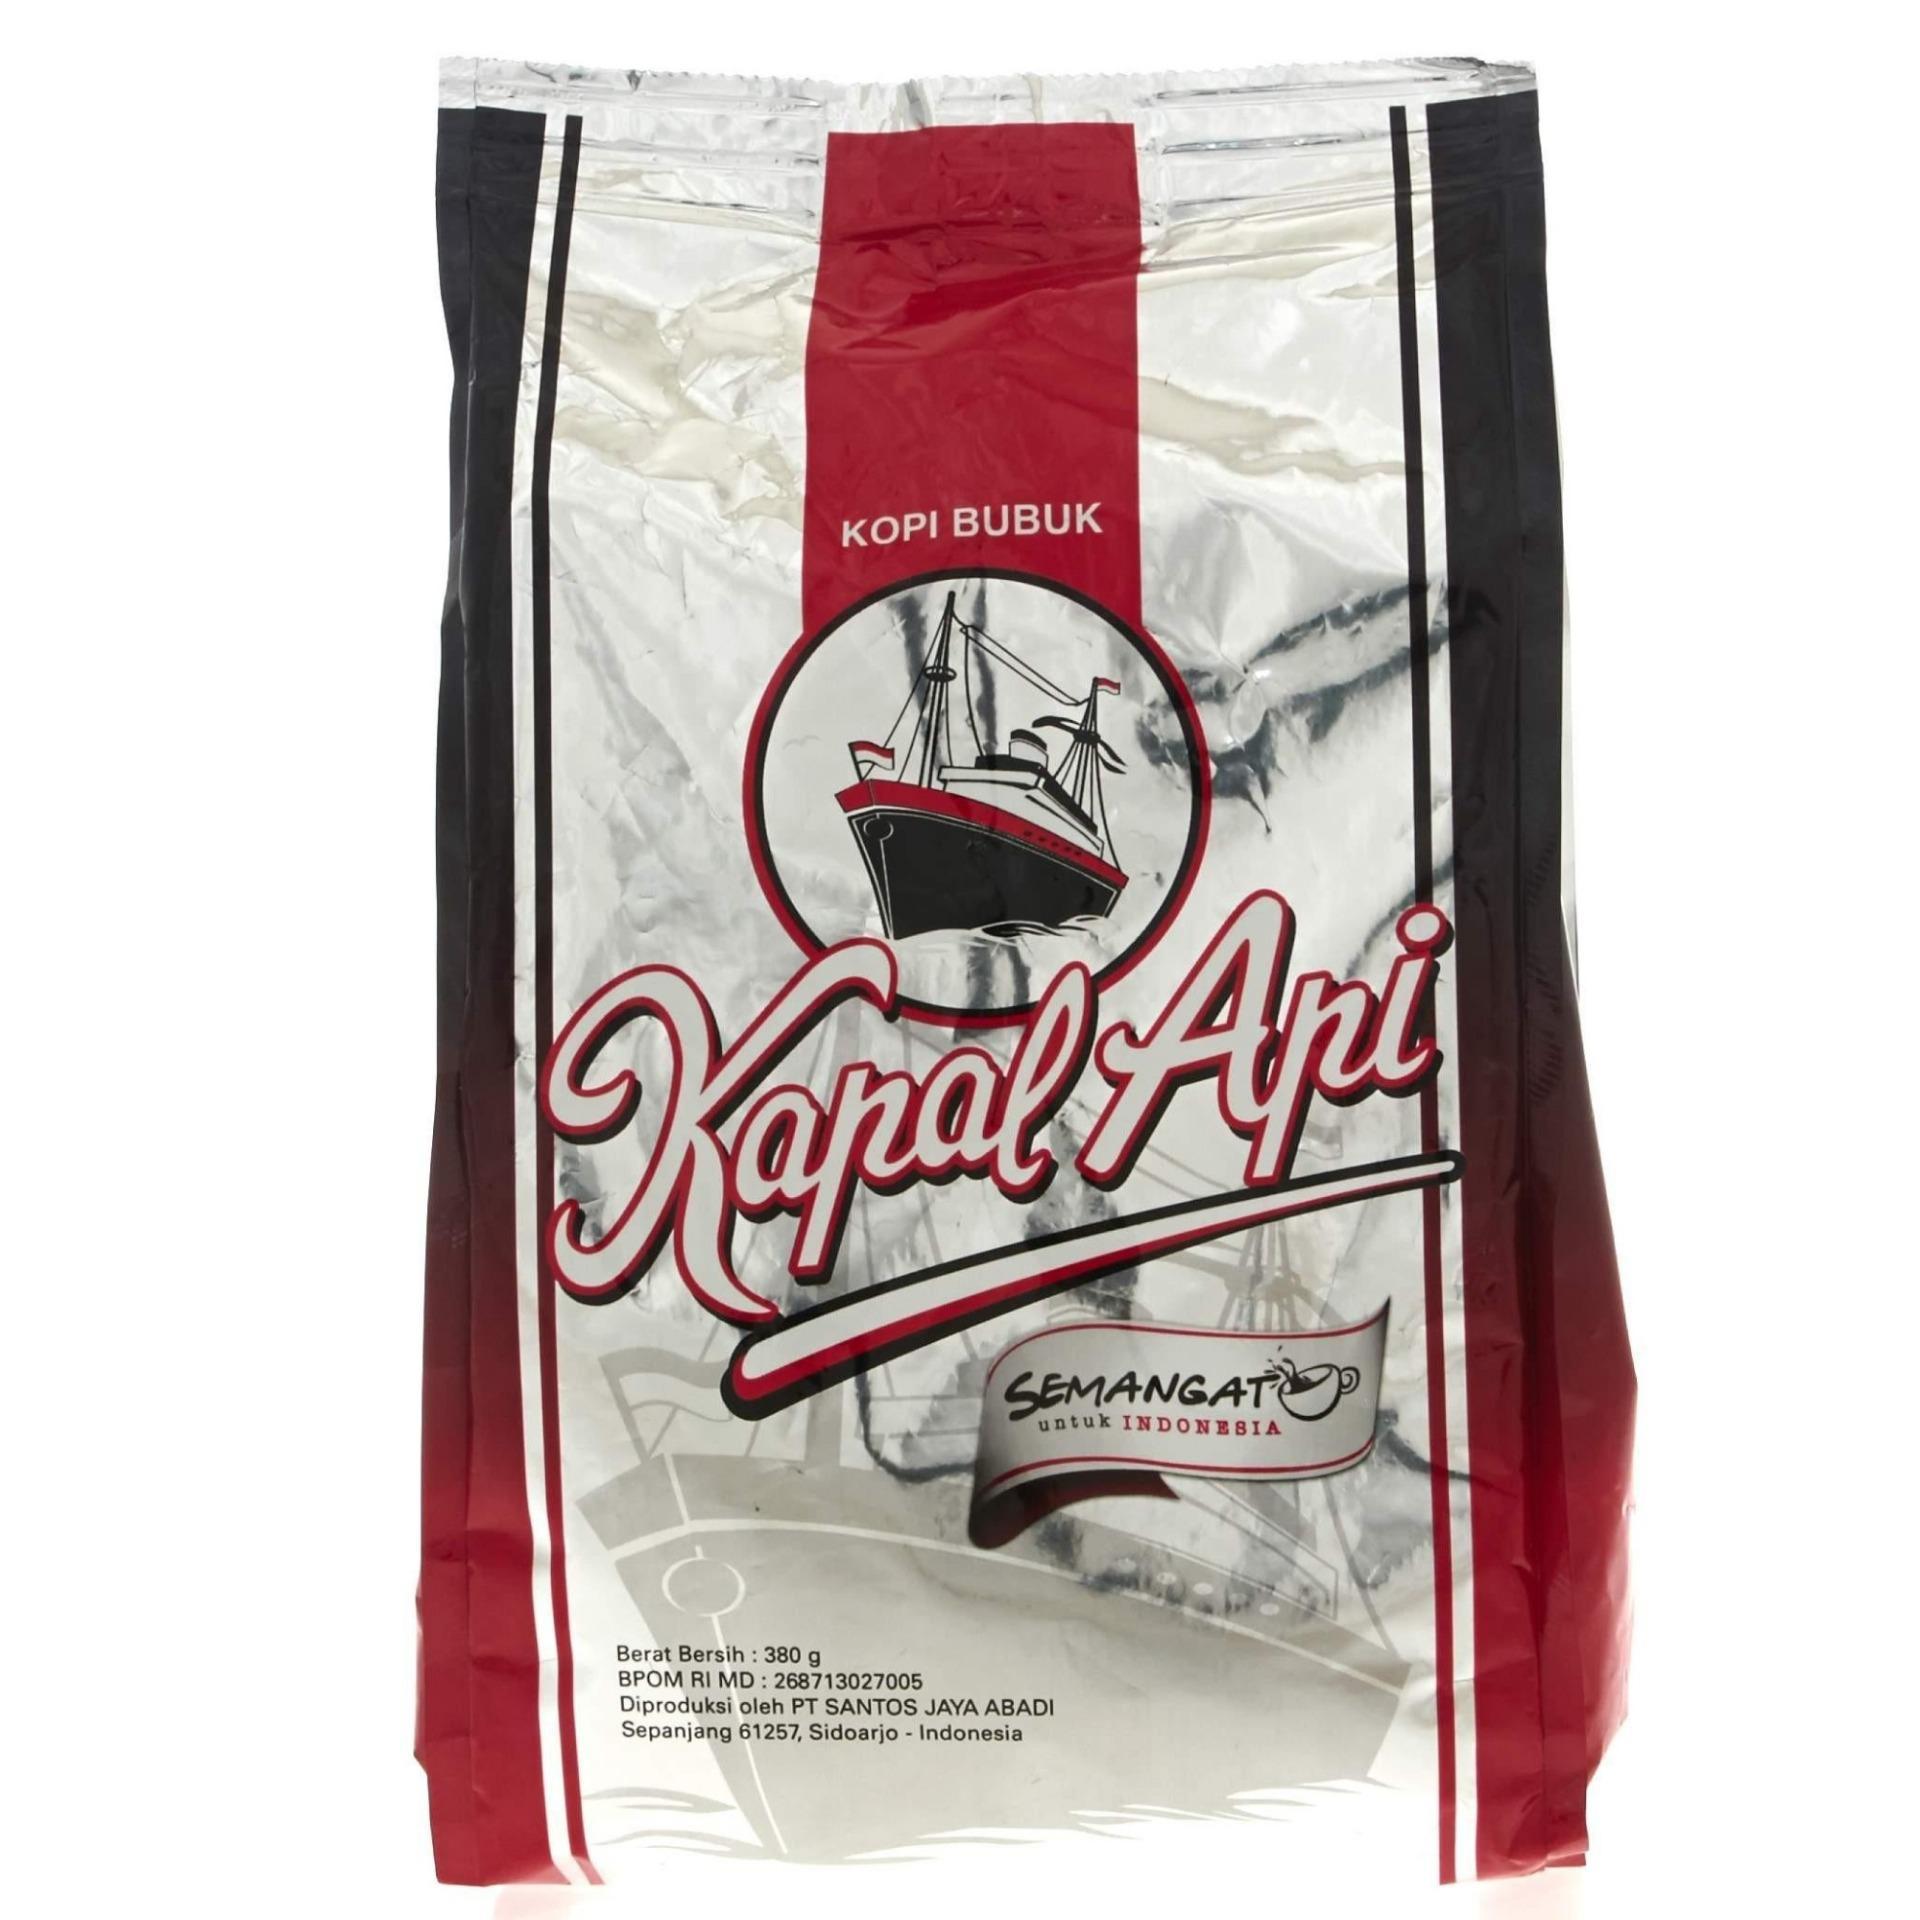 Harga Kapal Api Grande White Coffe With Choco Topping 20 Sachet Dan Toping Balm Plus Original Bpom Pretty Kopi Hitam 380 Gr